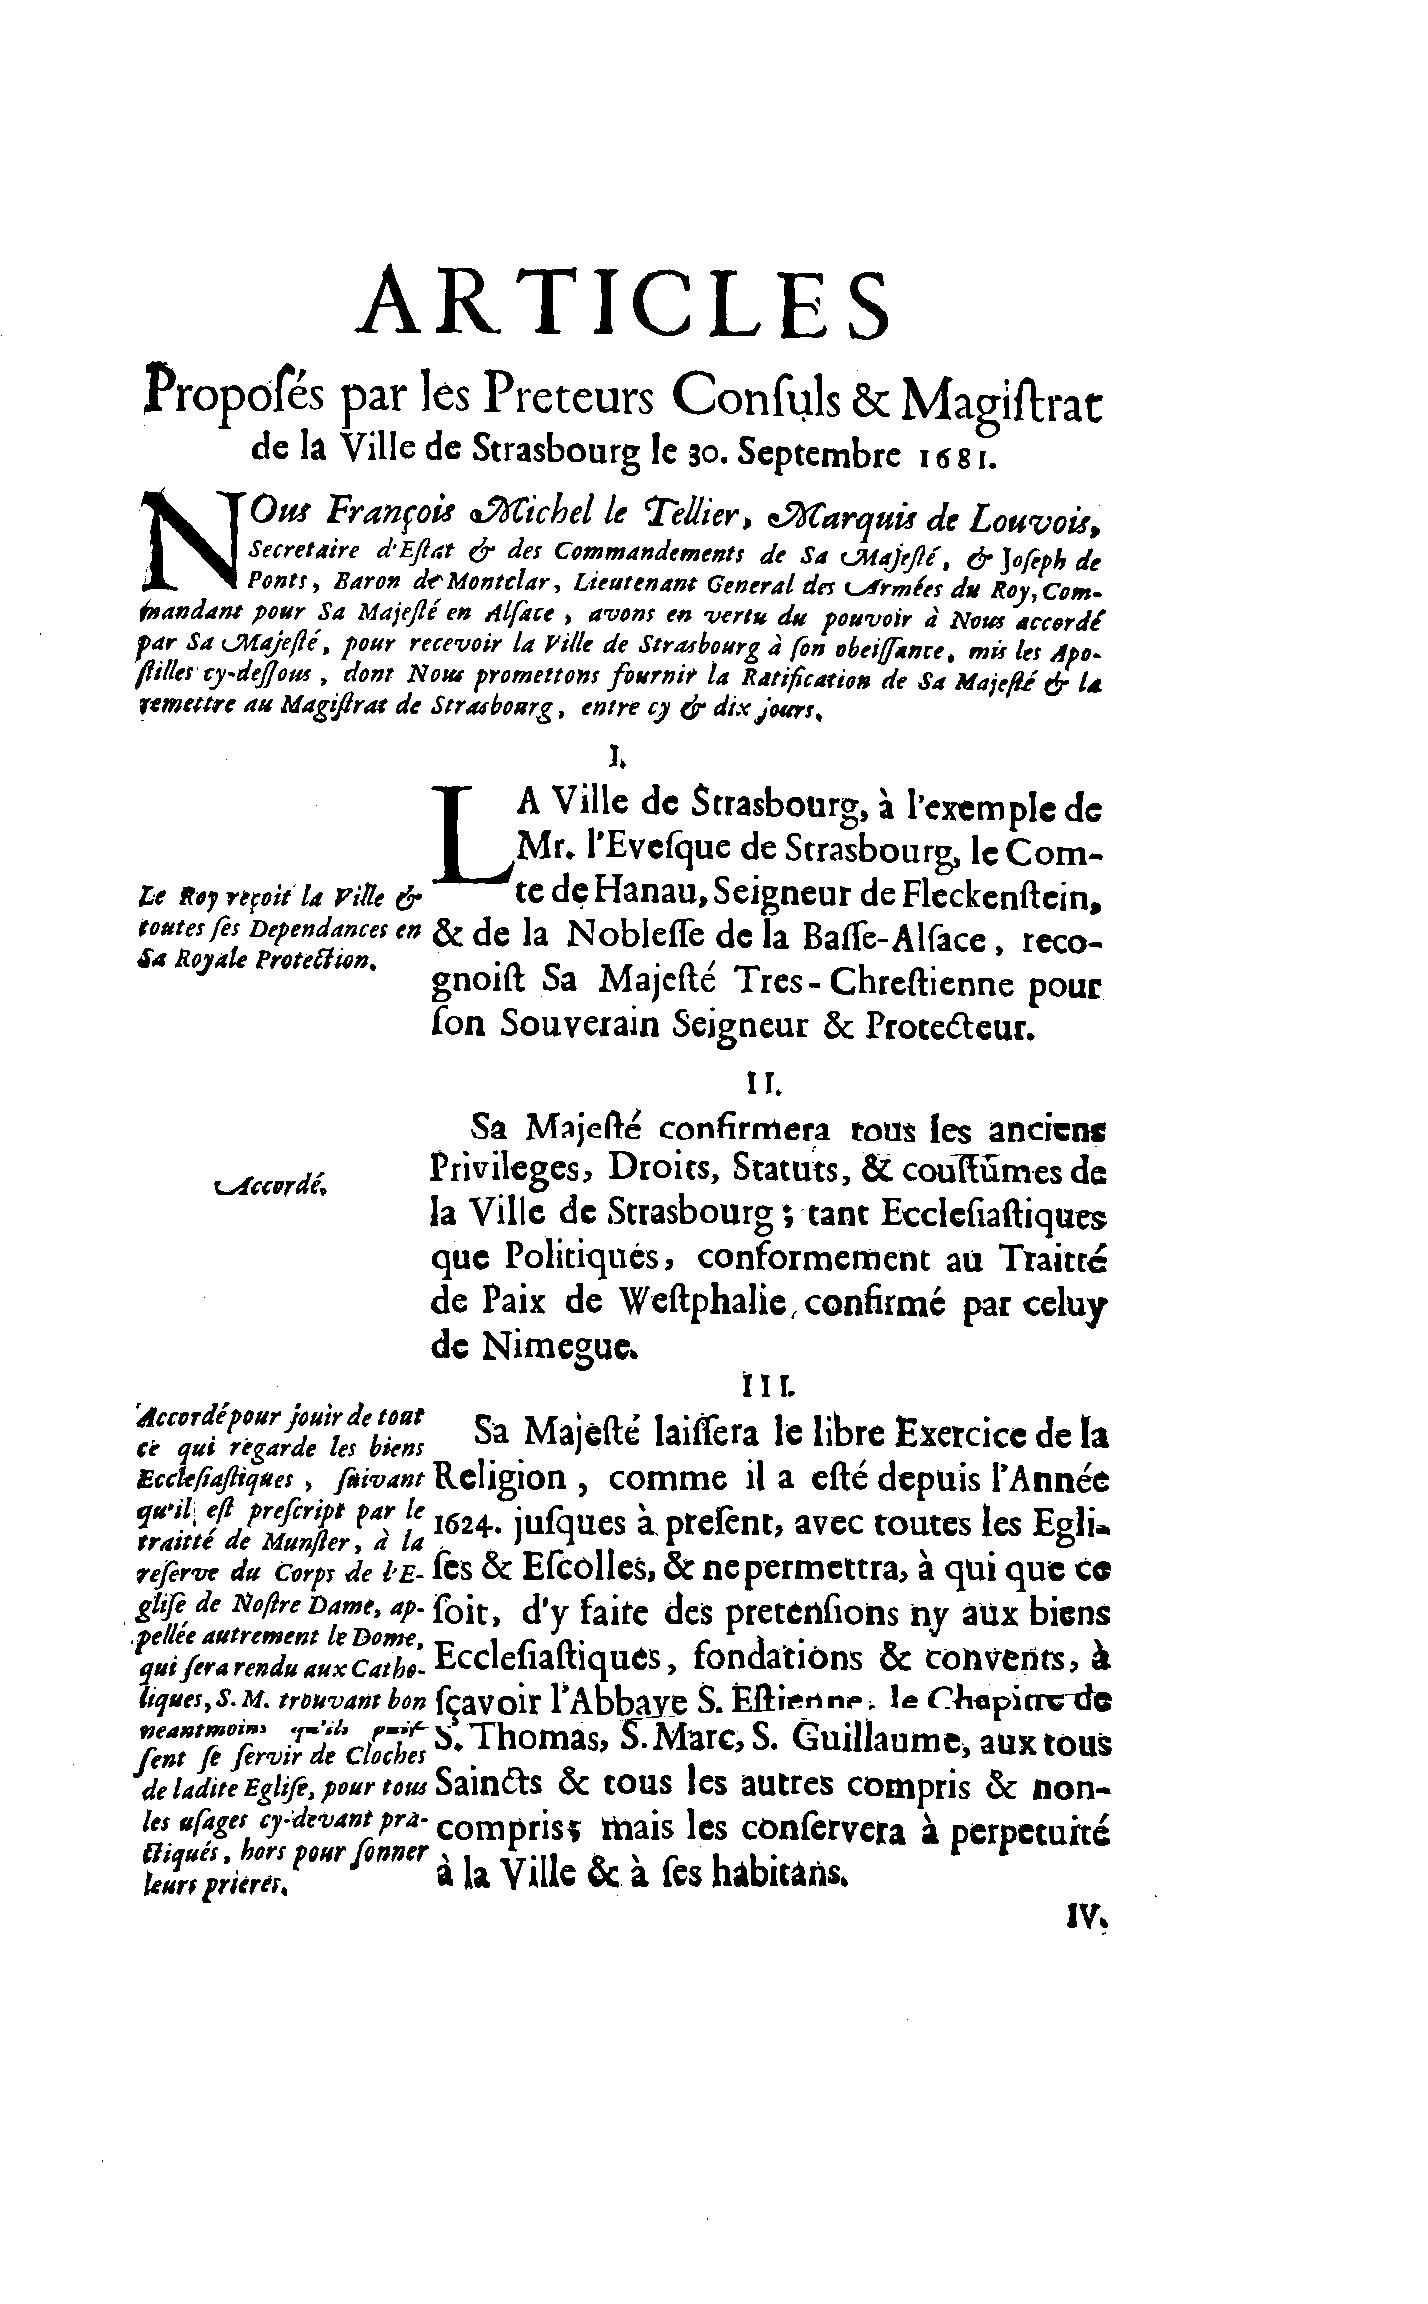 Capitulation 30 Septembre 1681